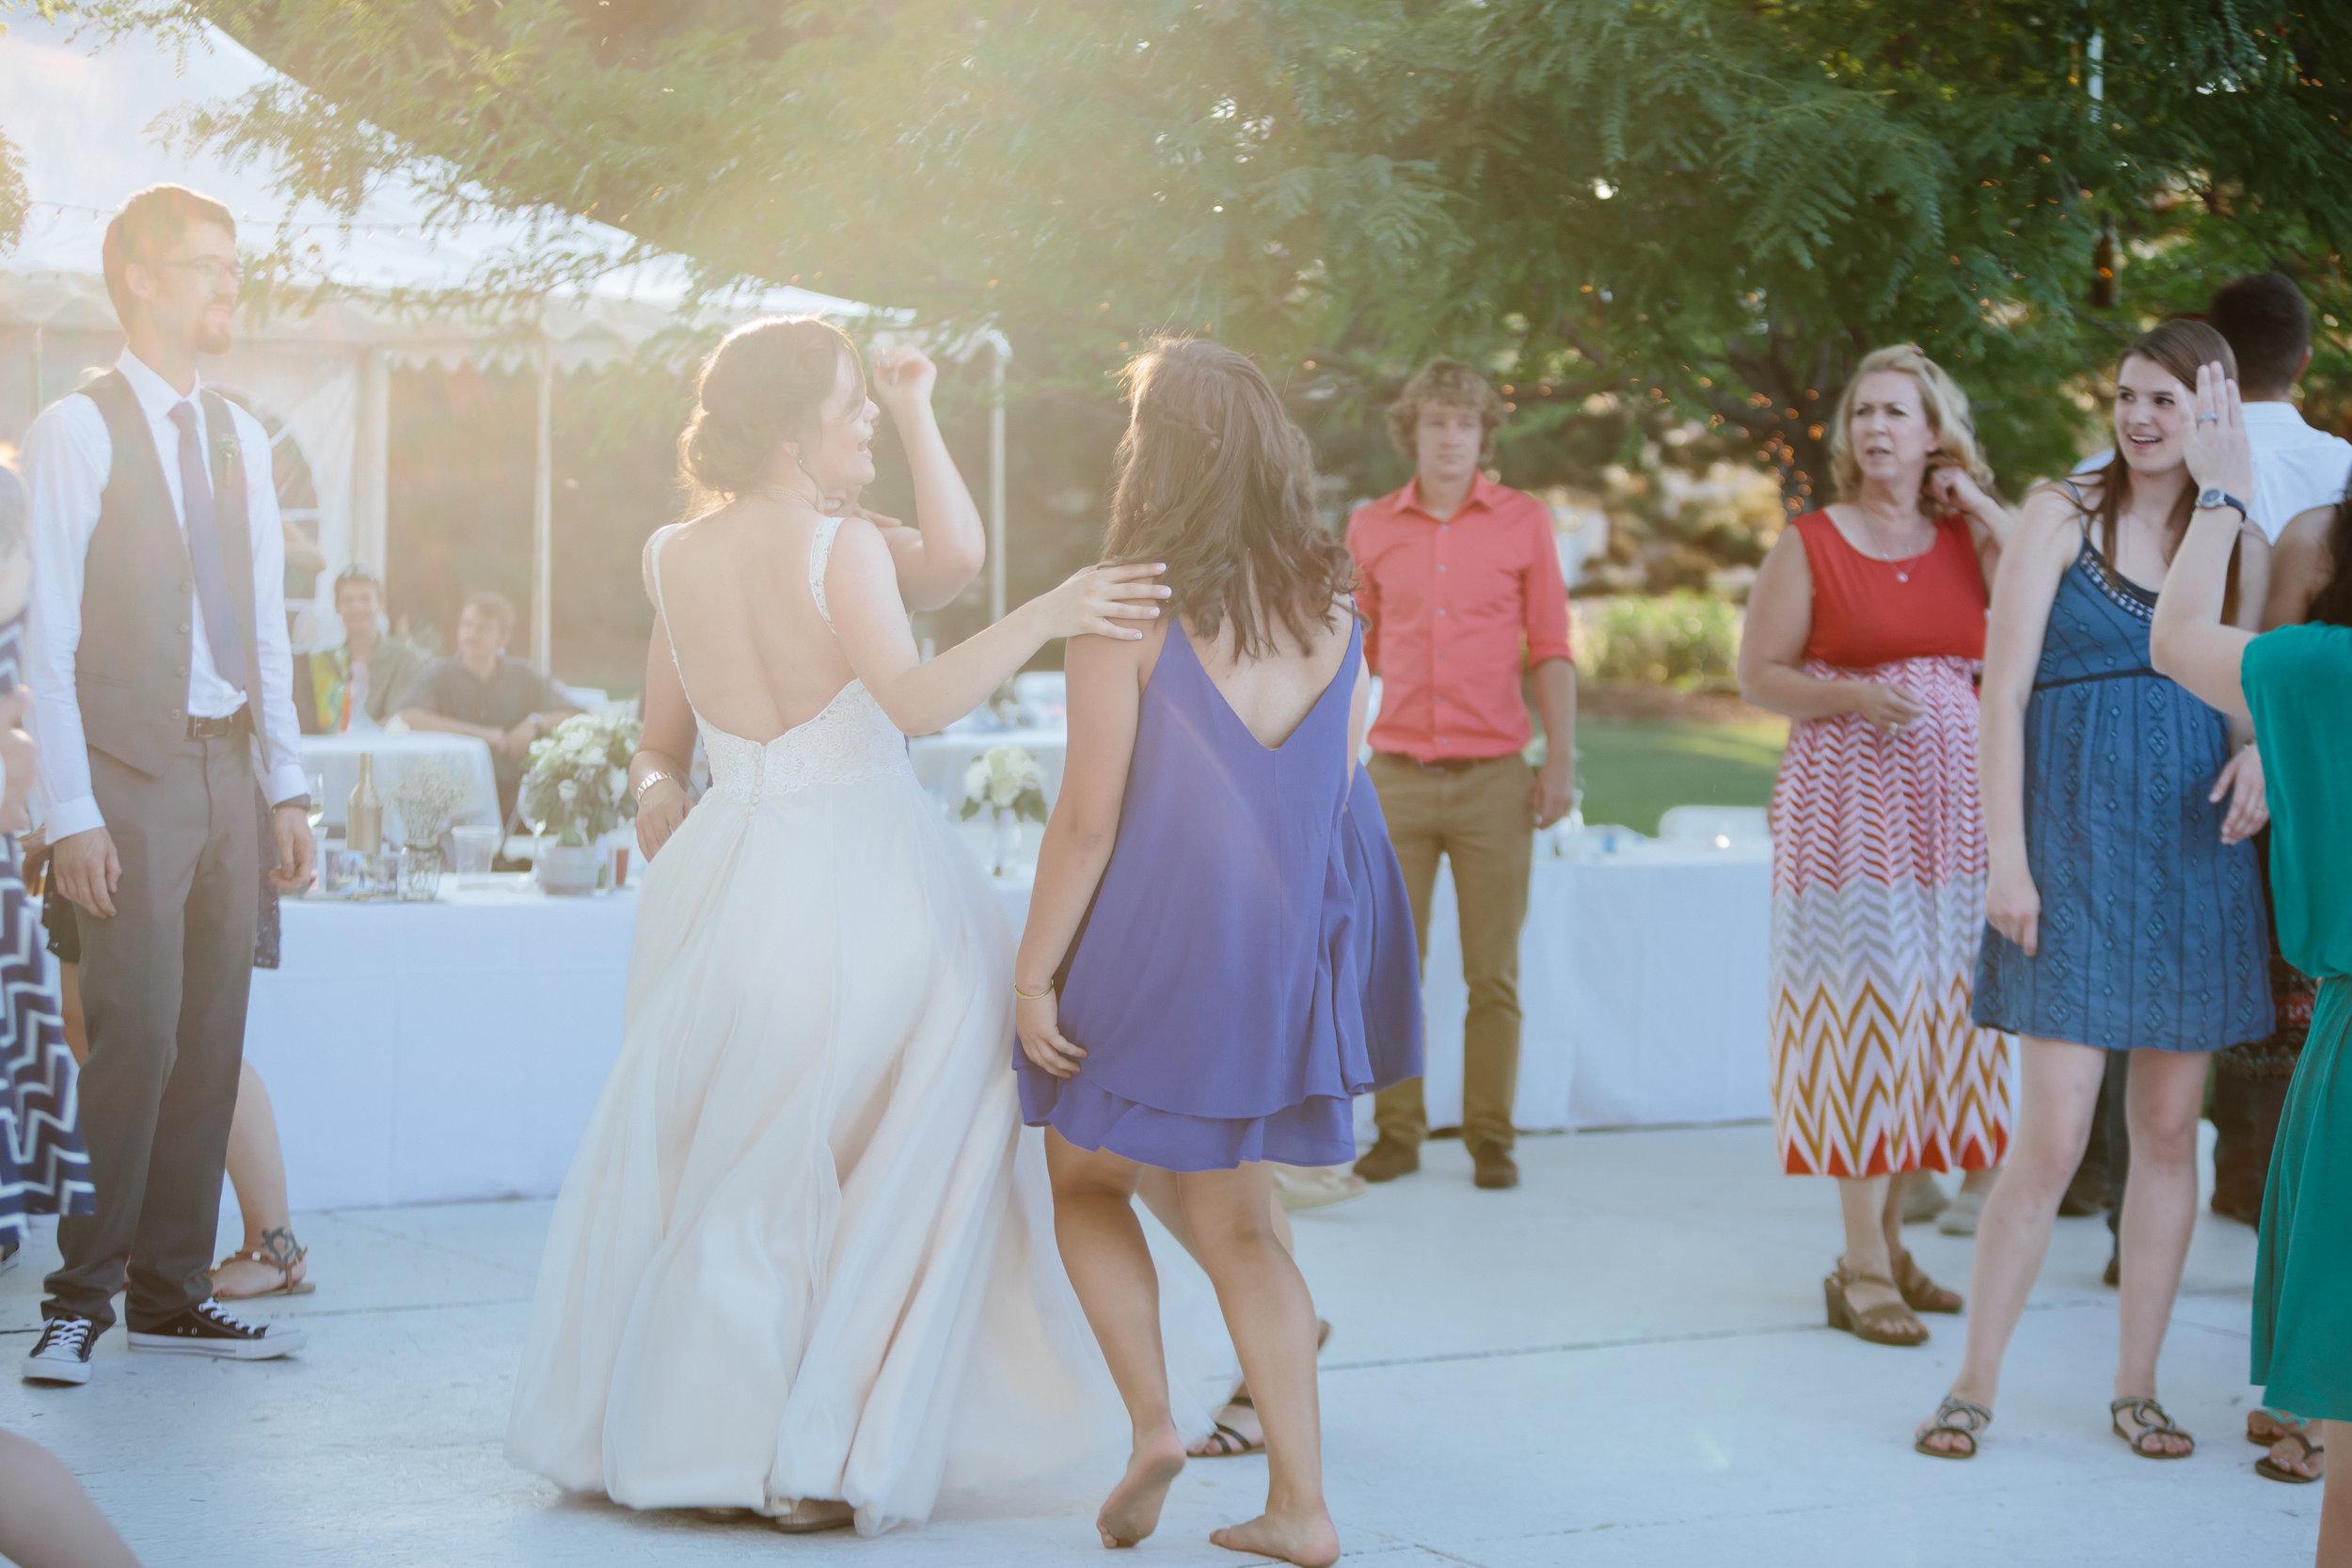 Jordan & Shantel Married - Idaho - Corrie Mick Photography-329.jpg